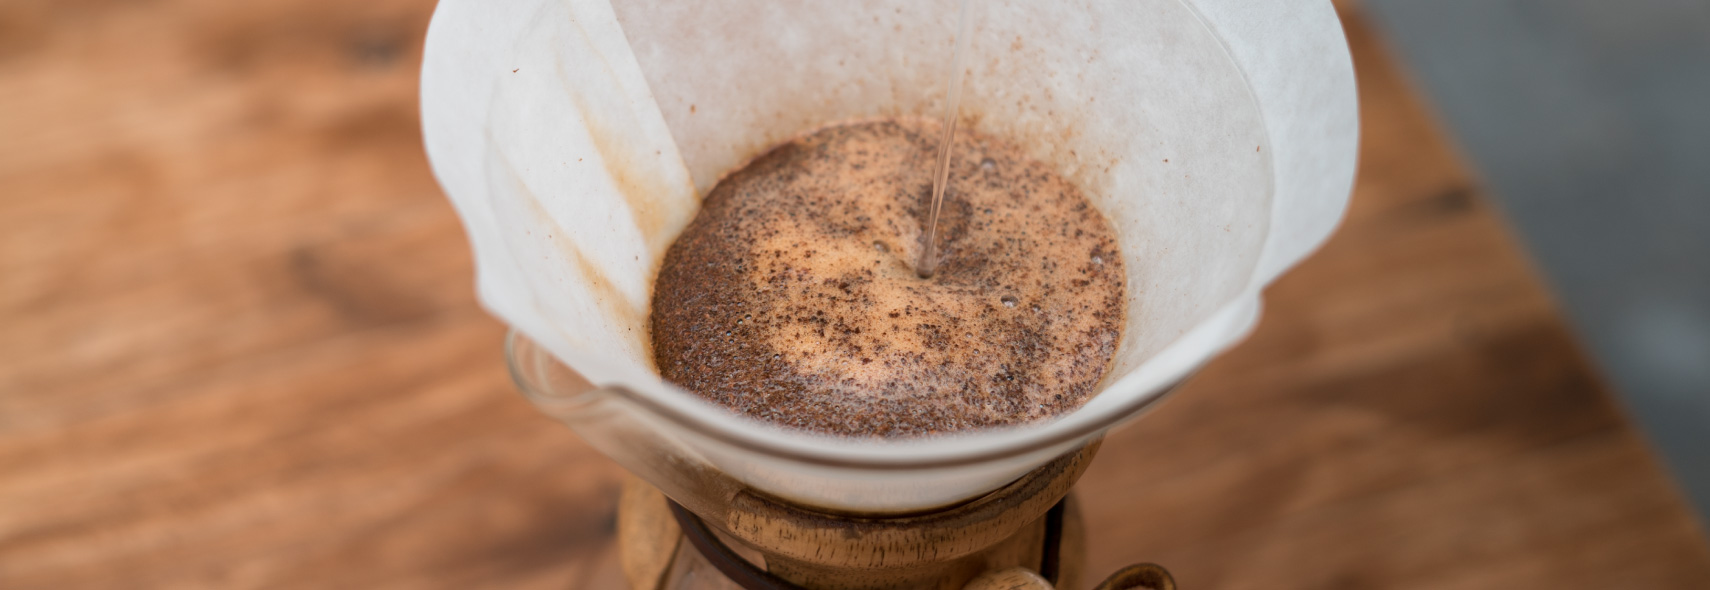 Barista brewing coffee into a chemex